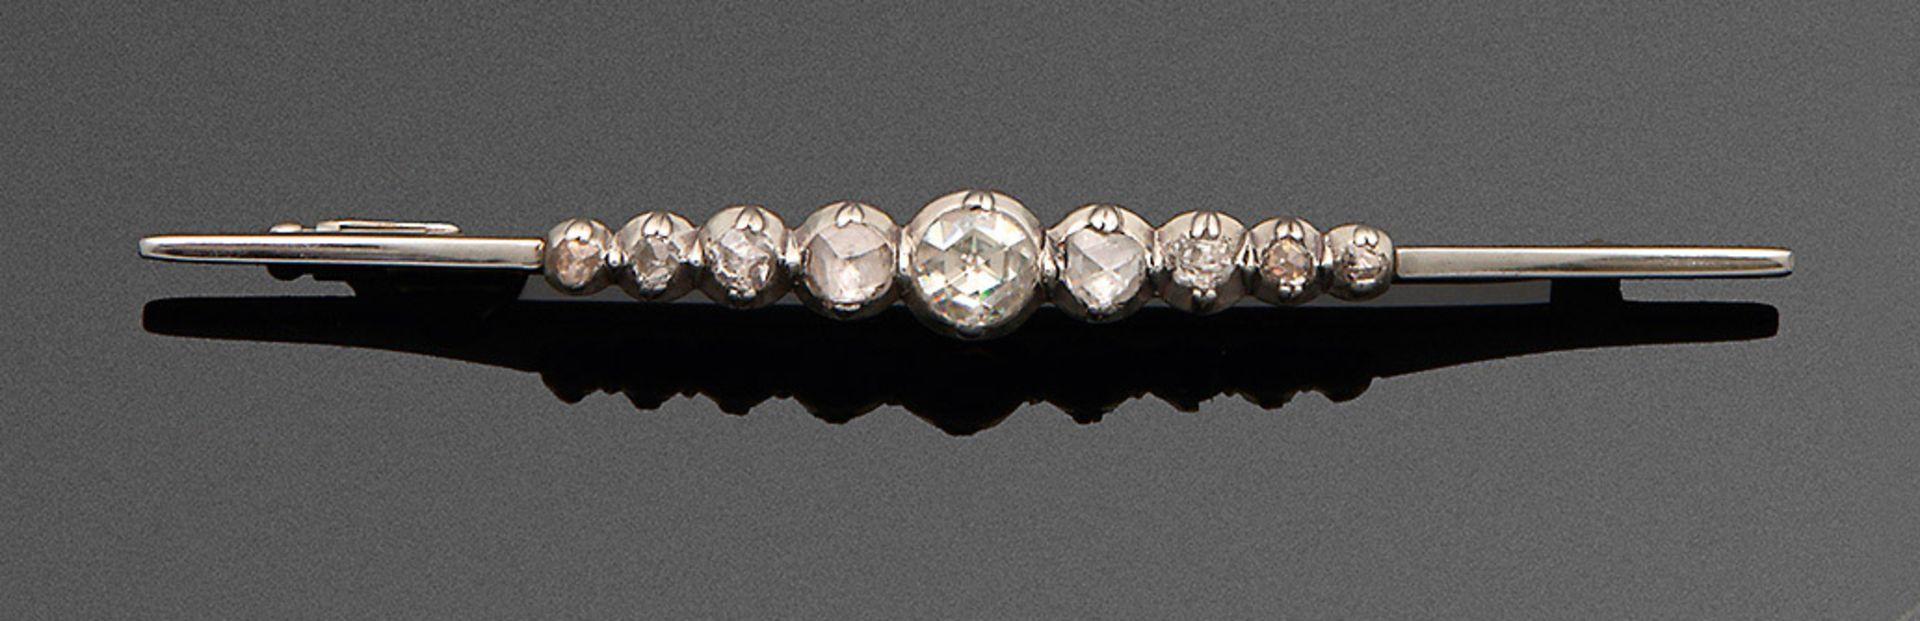 Stabnadel mit Diamantrosen